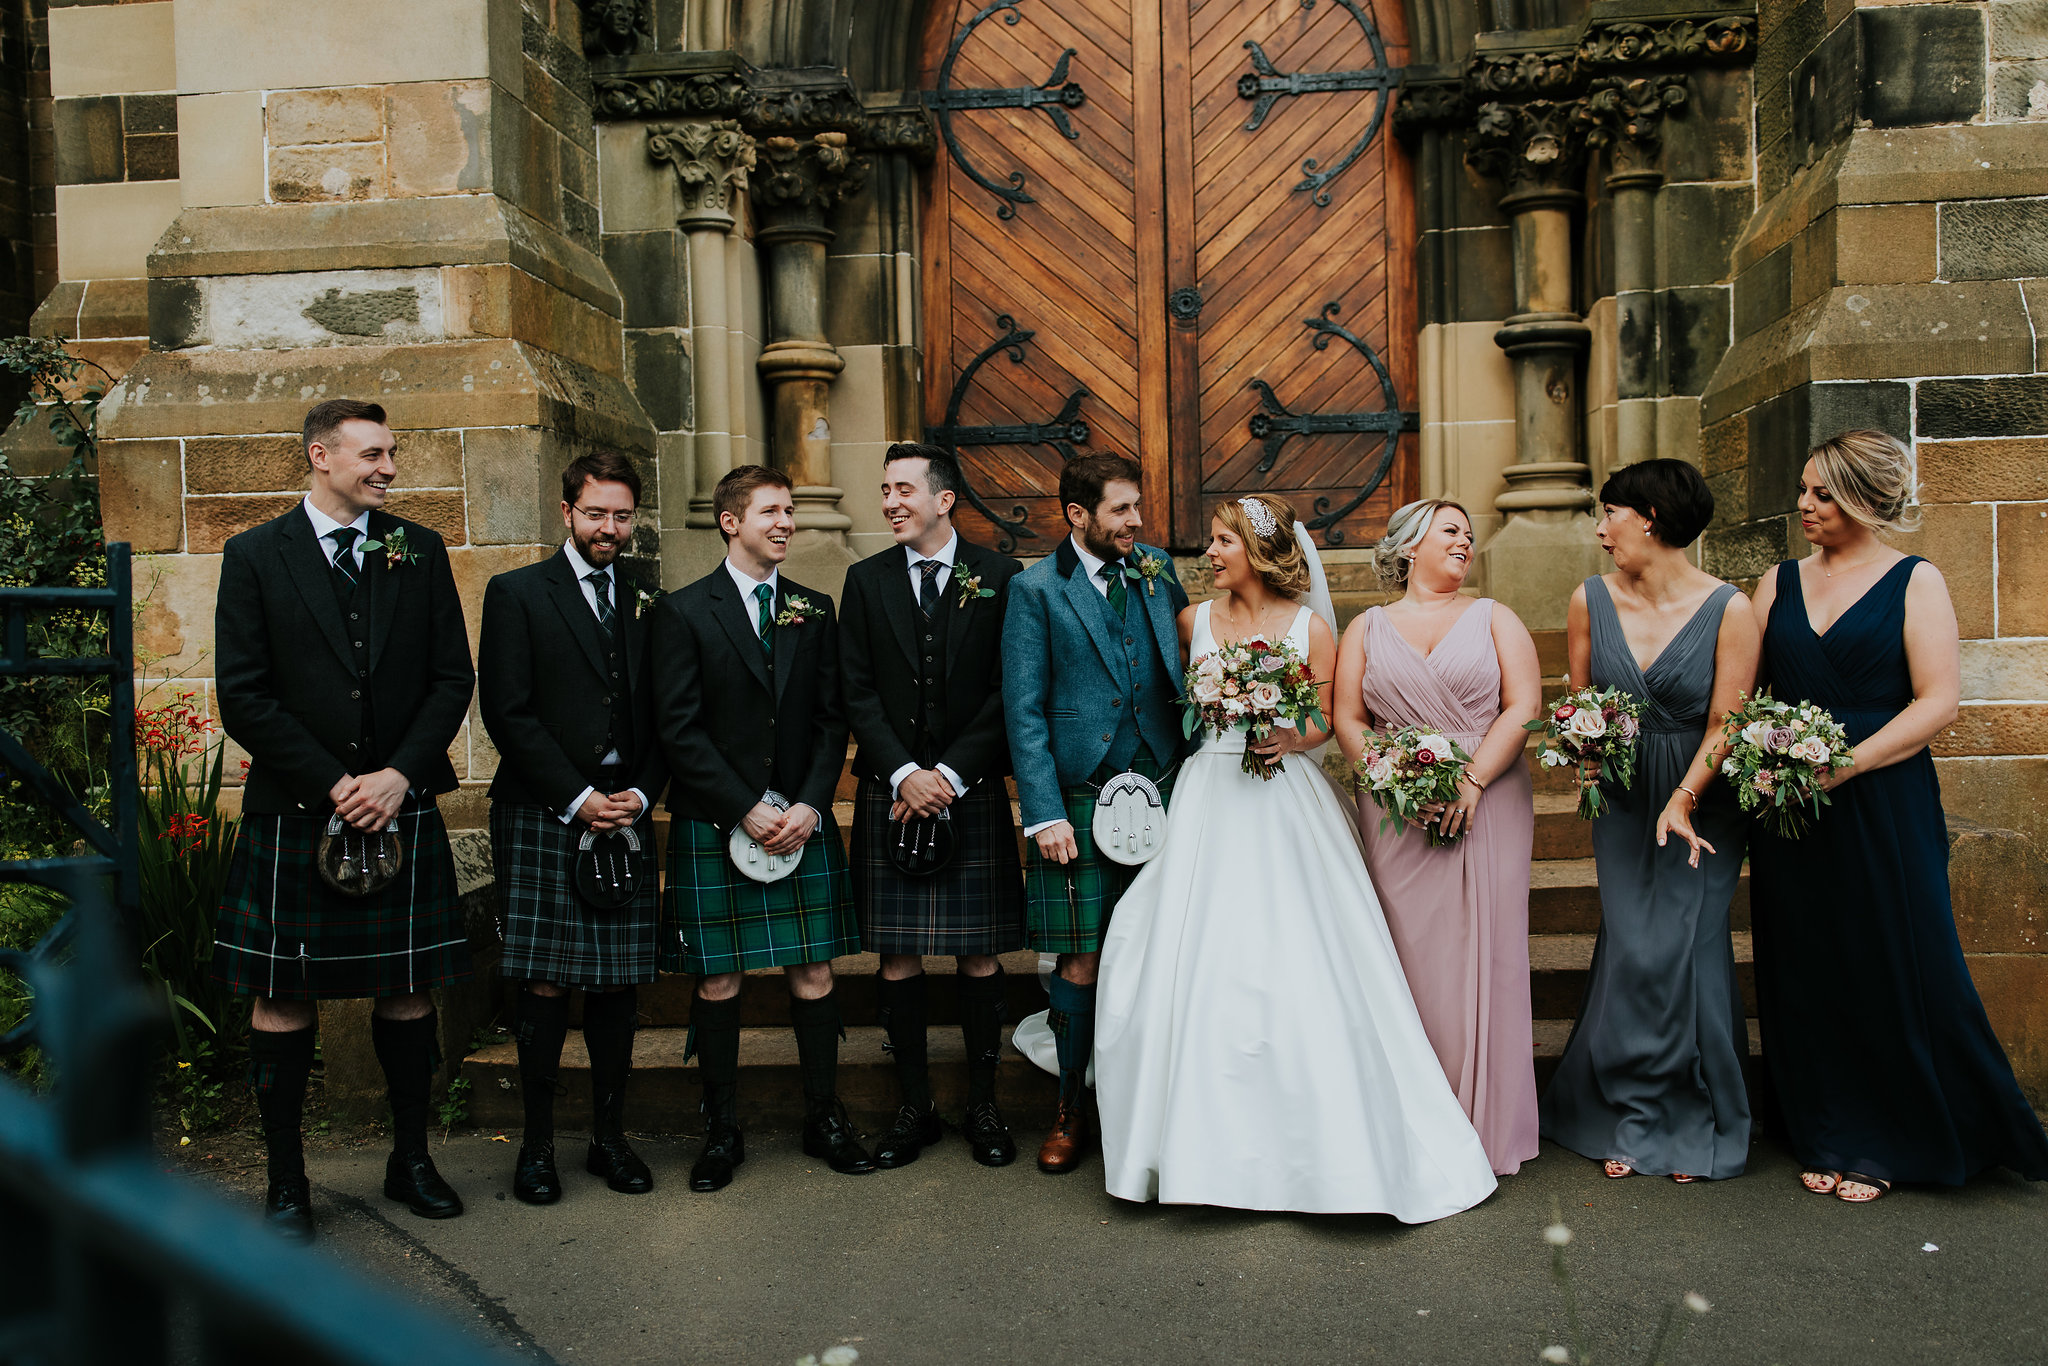 Cottiers wedding lavender and rose wedding florists scotland12.jpg